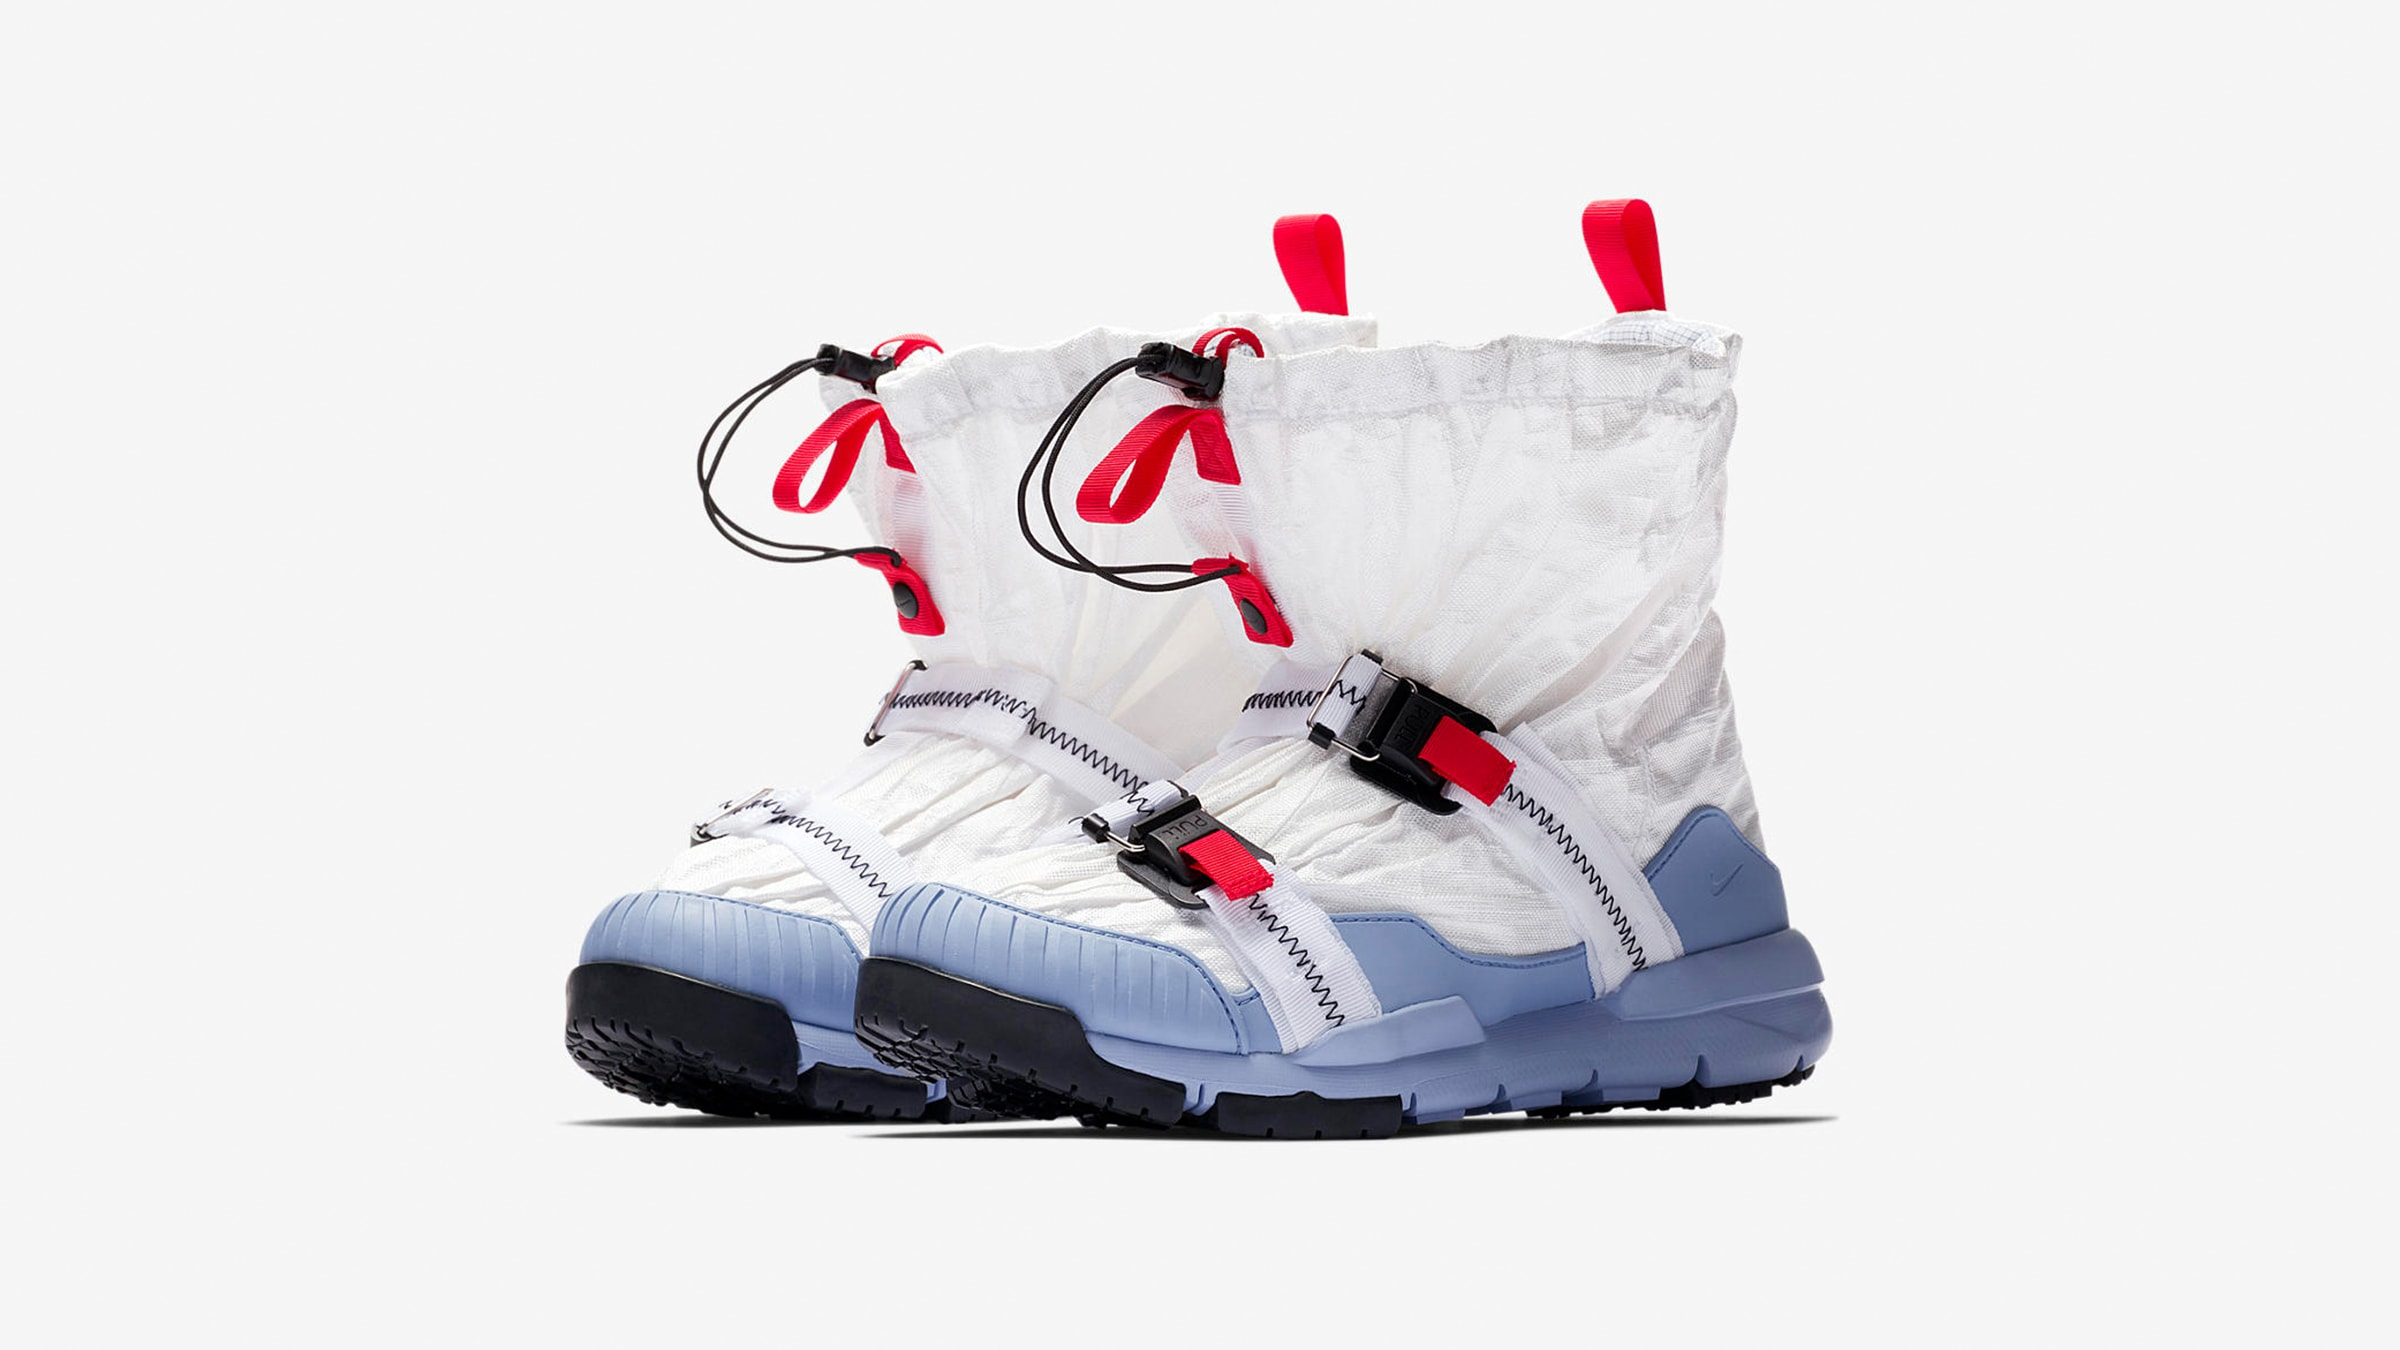 Nike Mars Yard Overshoe - AH7767-101